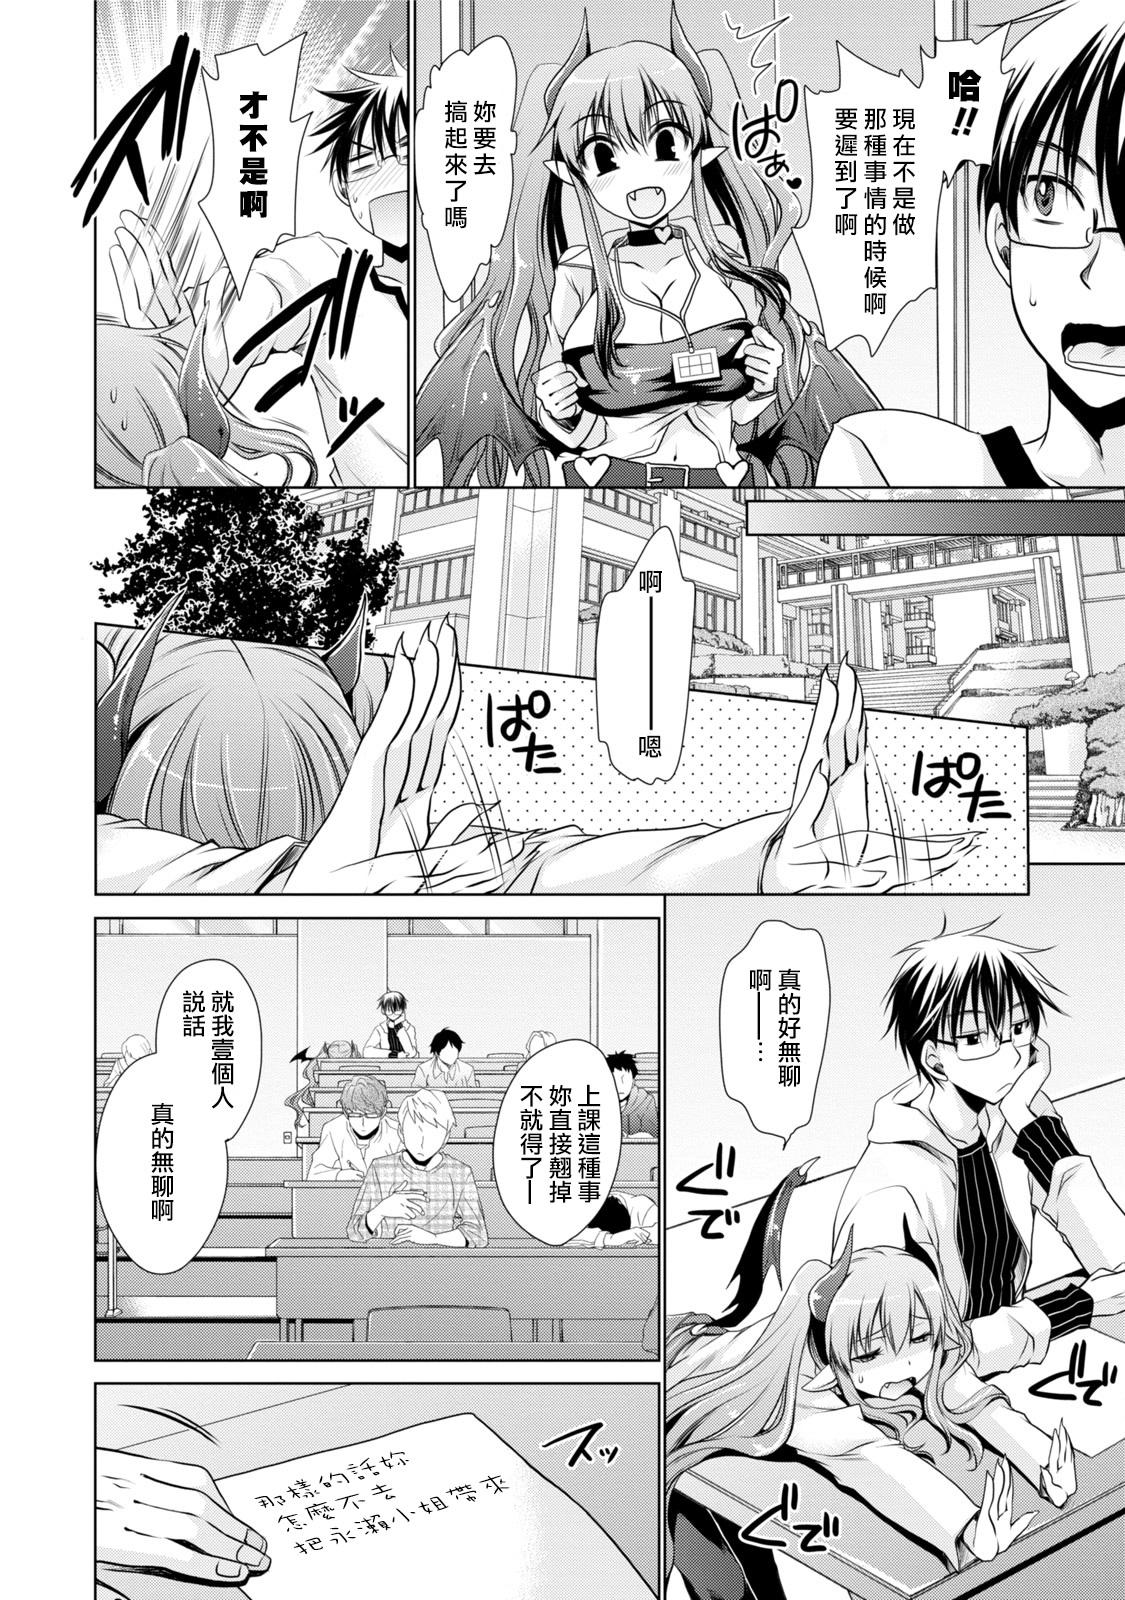 [Shinonome Ryu] Ore to Kanojo to Owaru Sekai - World's end LoveStory 1-5 [Chinese] [爱弹幕汉化组] [Digital] 71